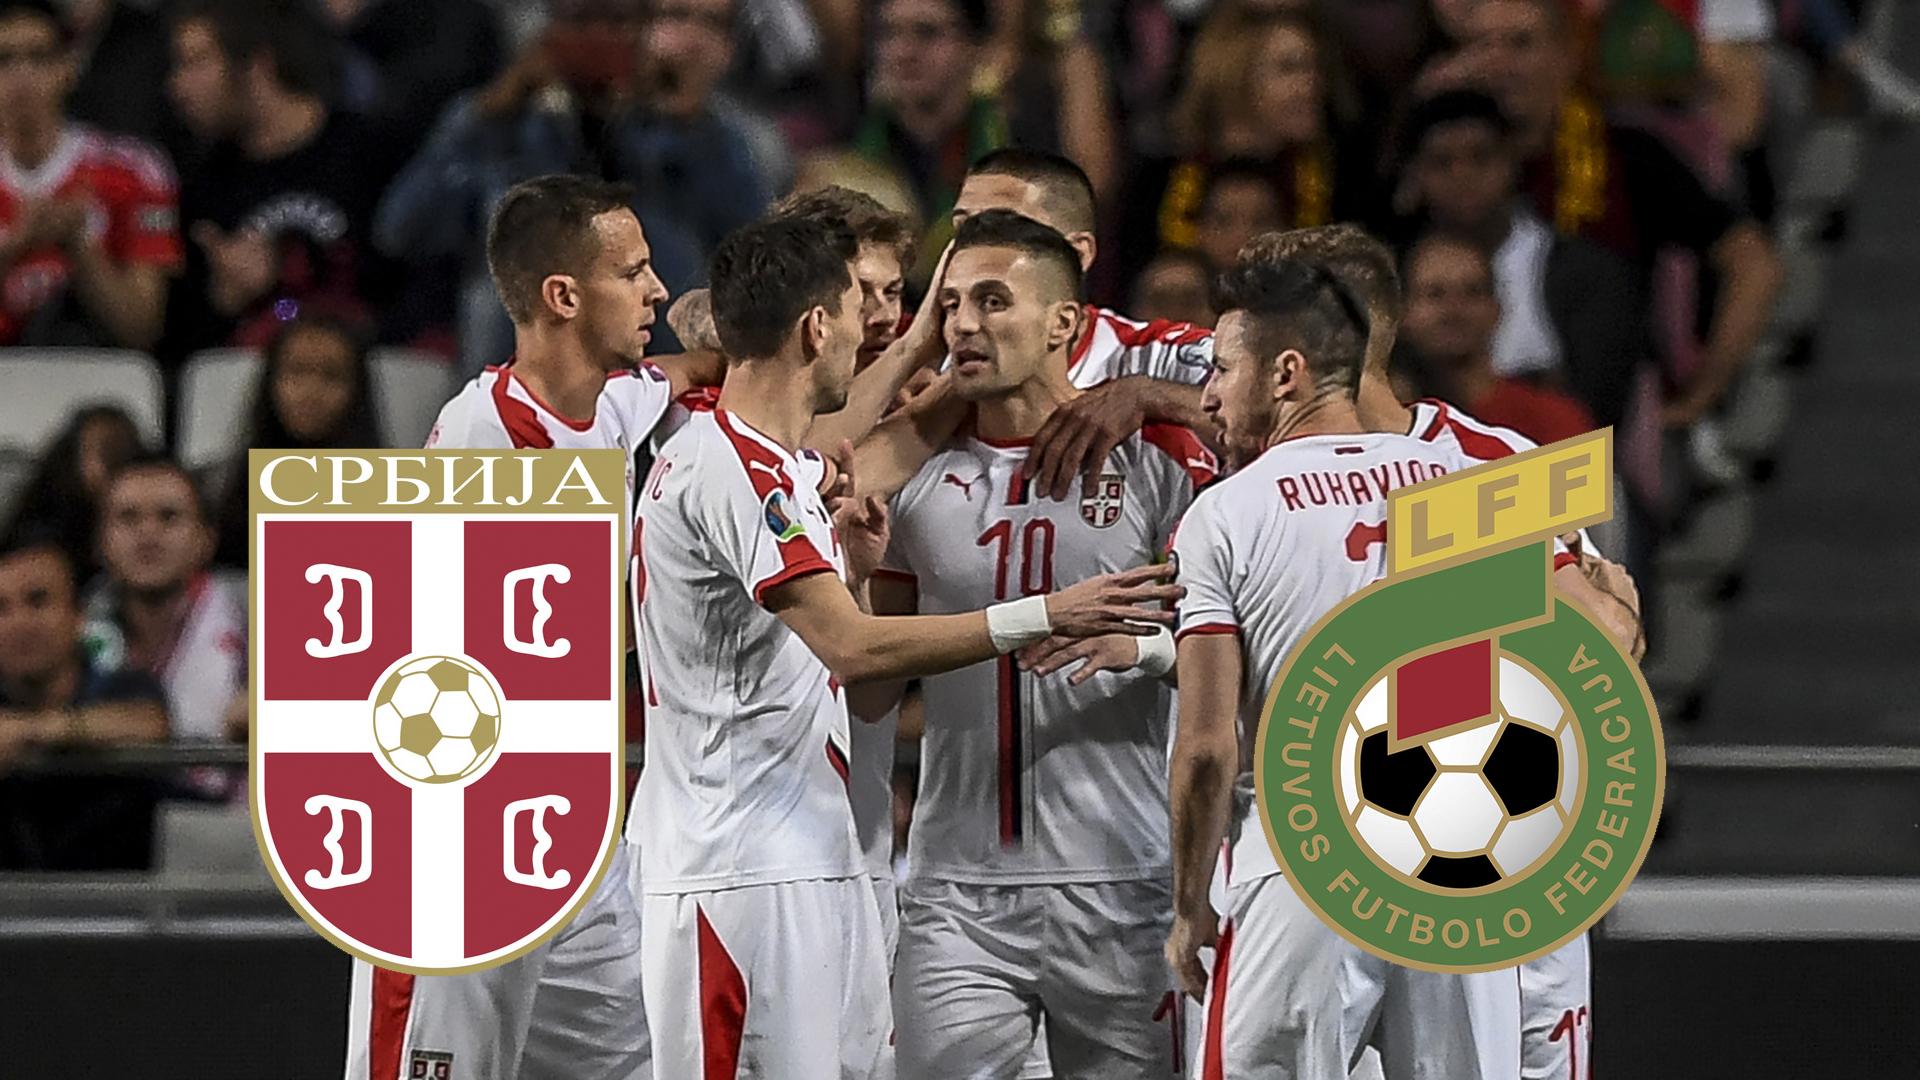 Wer Zeigt Ubertragt Serbien Vs Litauen Heute Live Im Tv